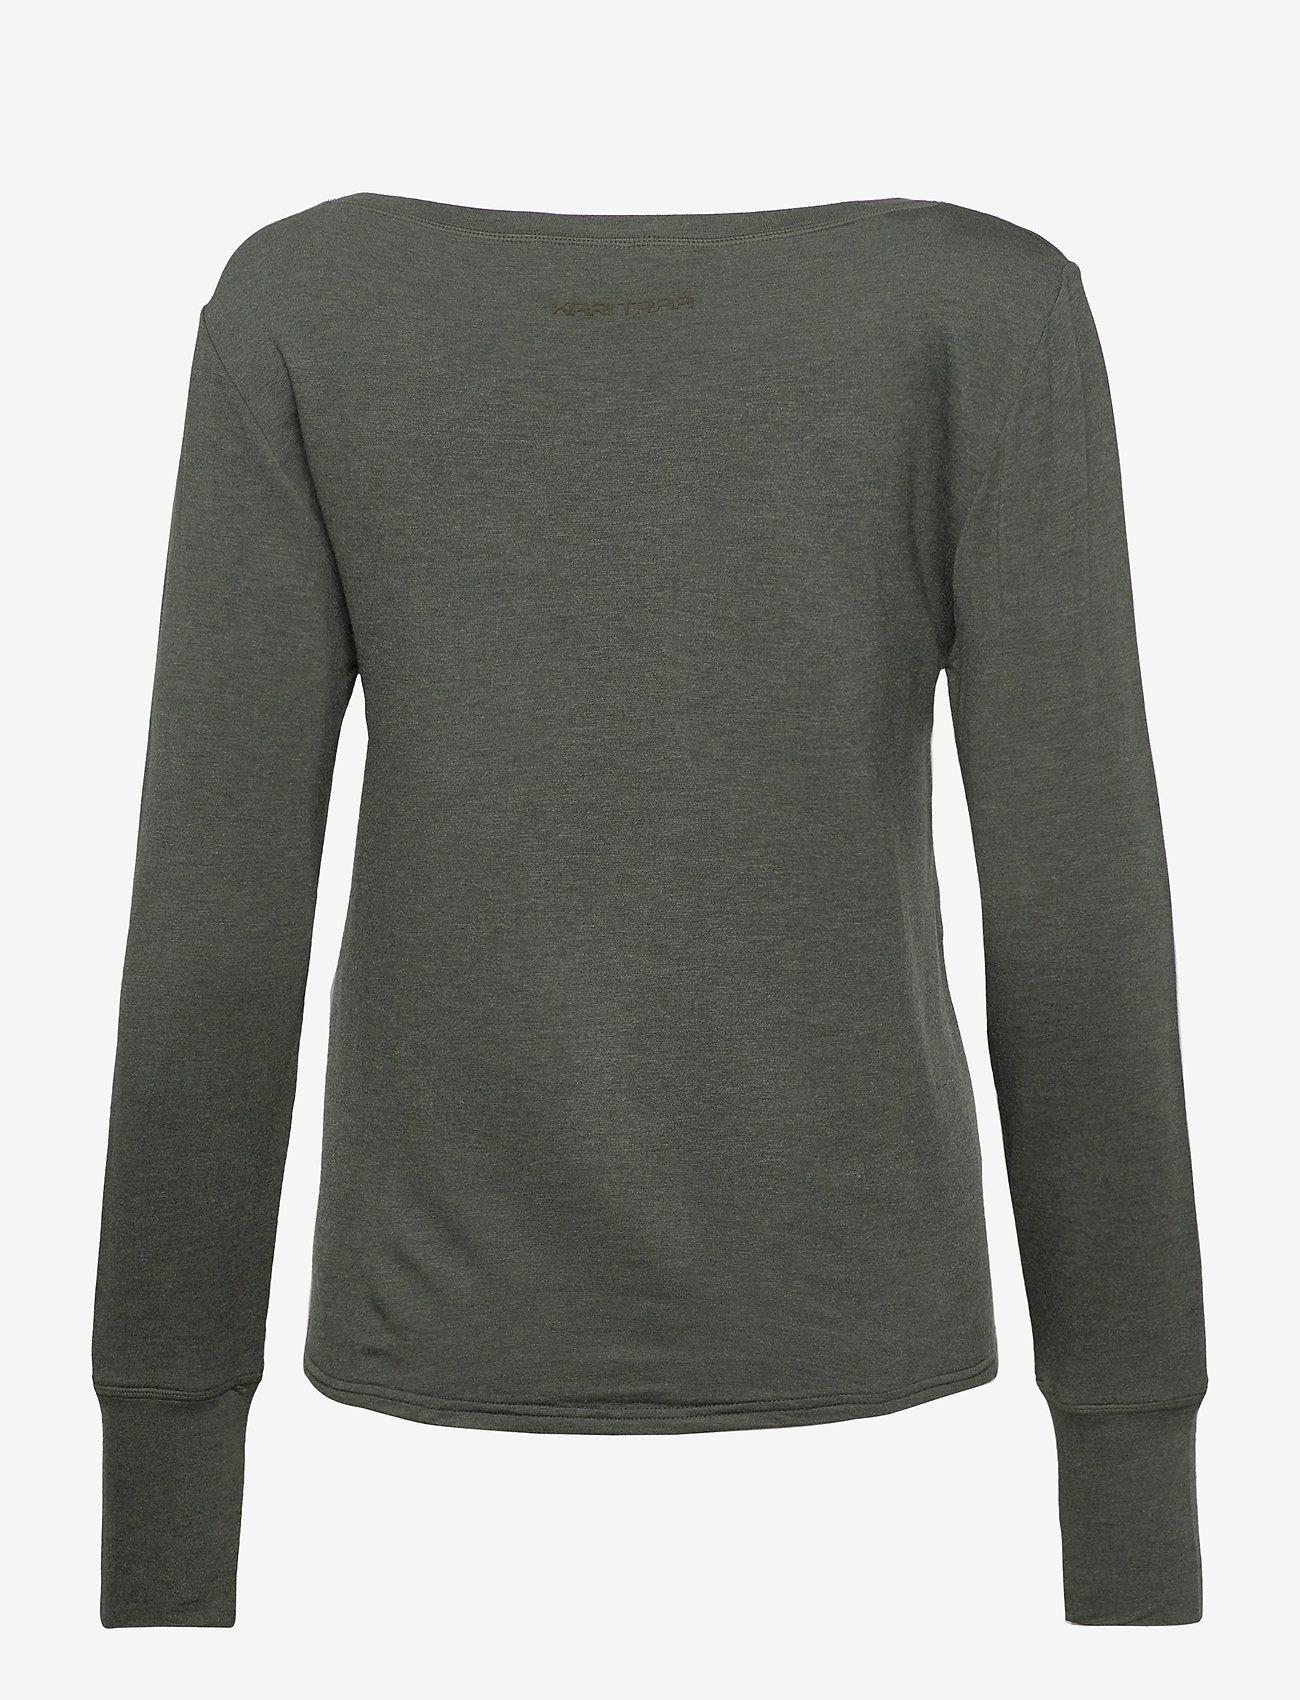 Kari Traa - VICTORIA LS - bluzki z długim rękawem - woods - 1